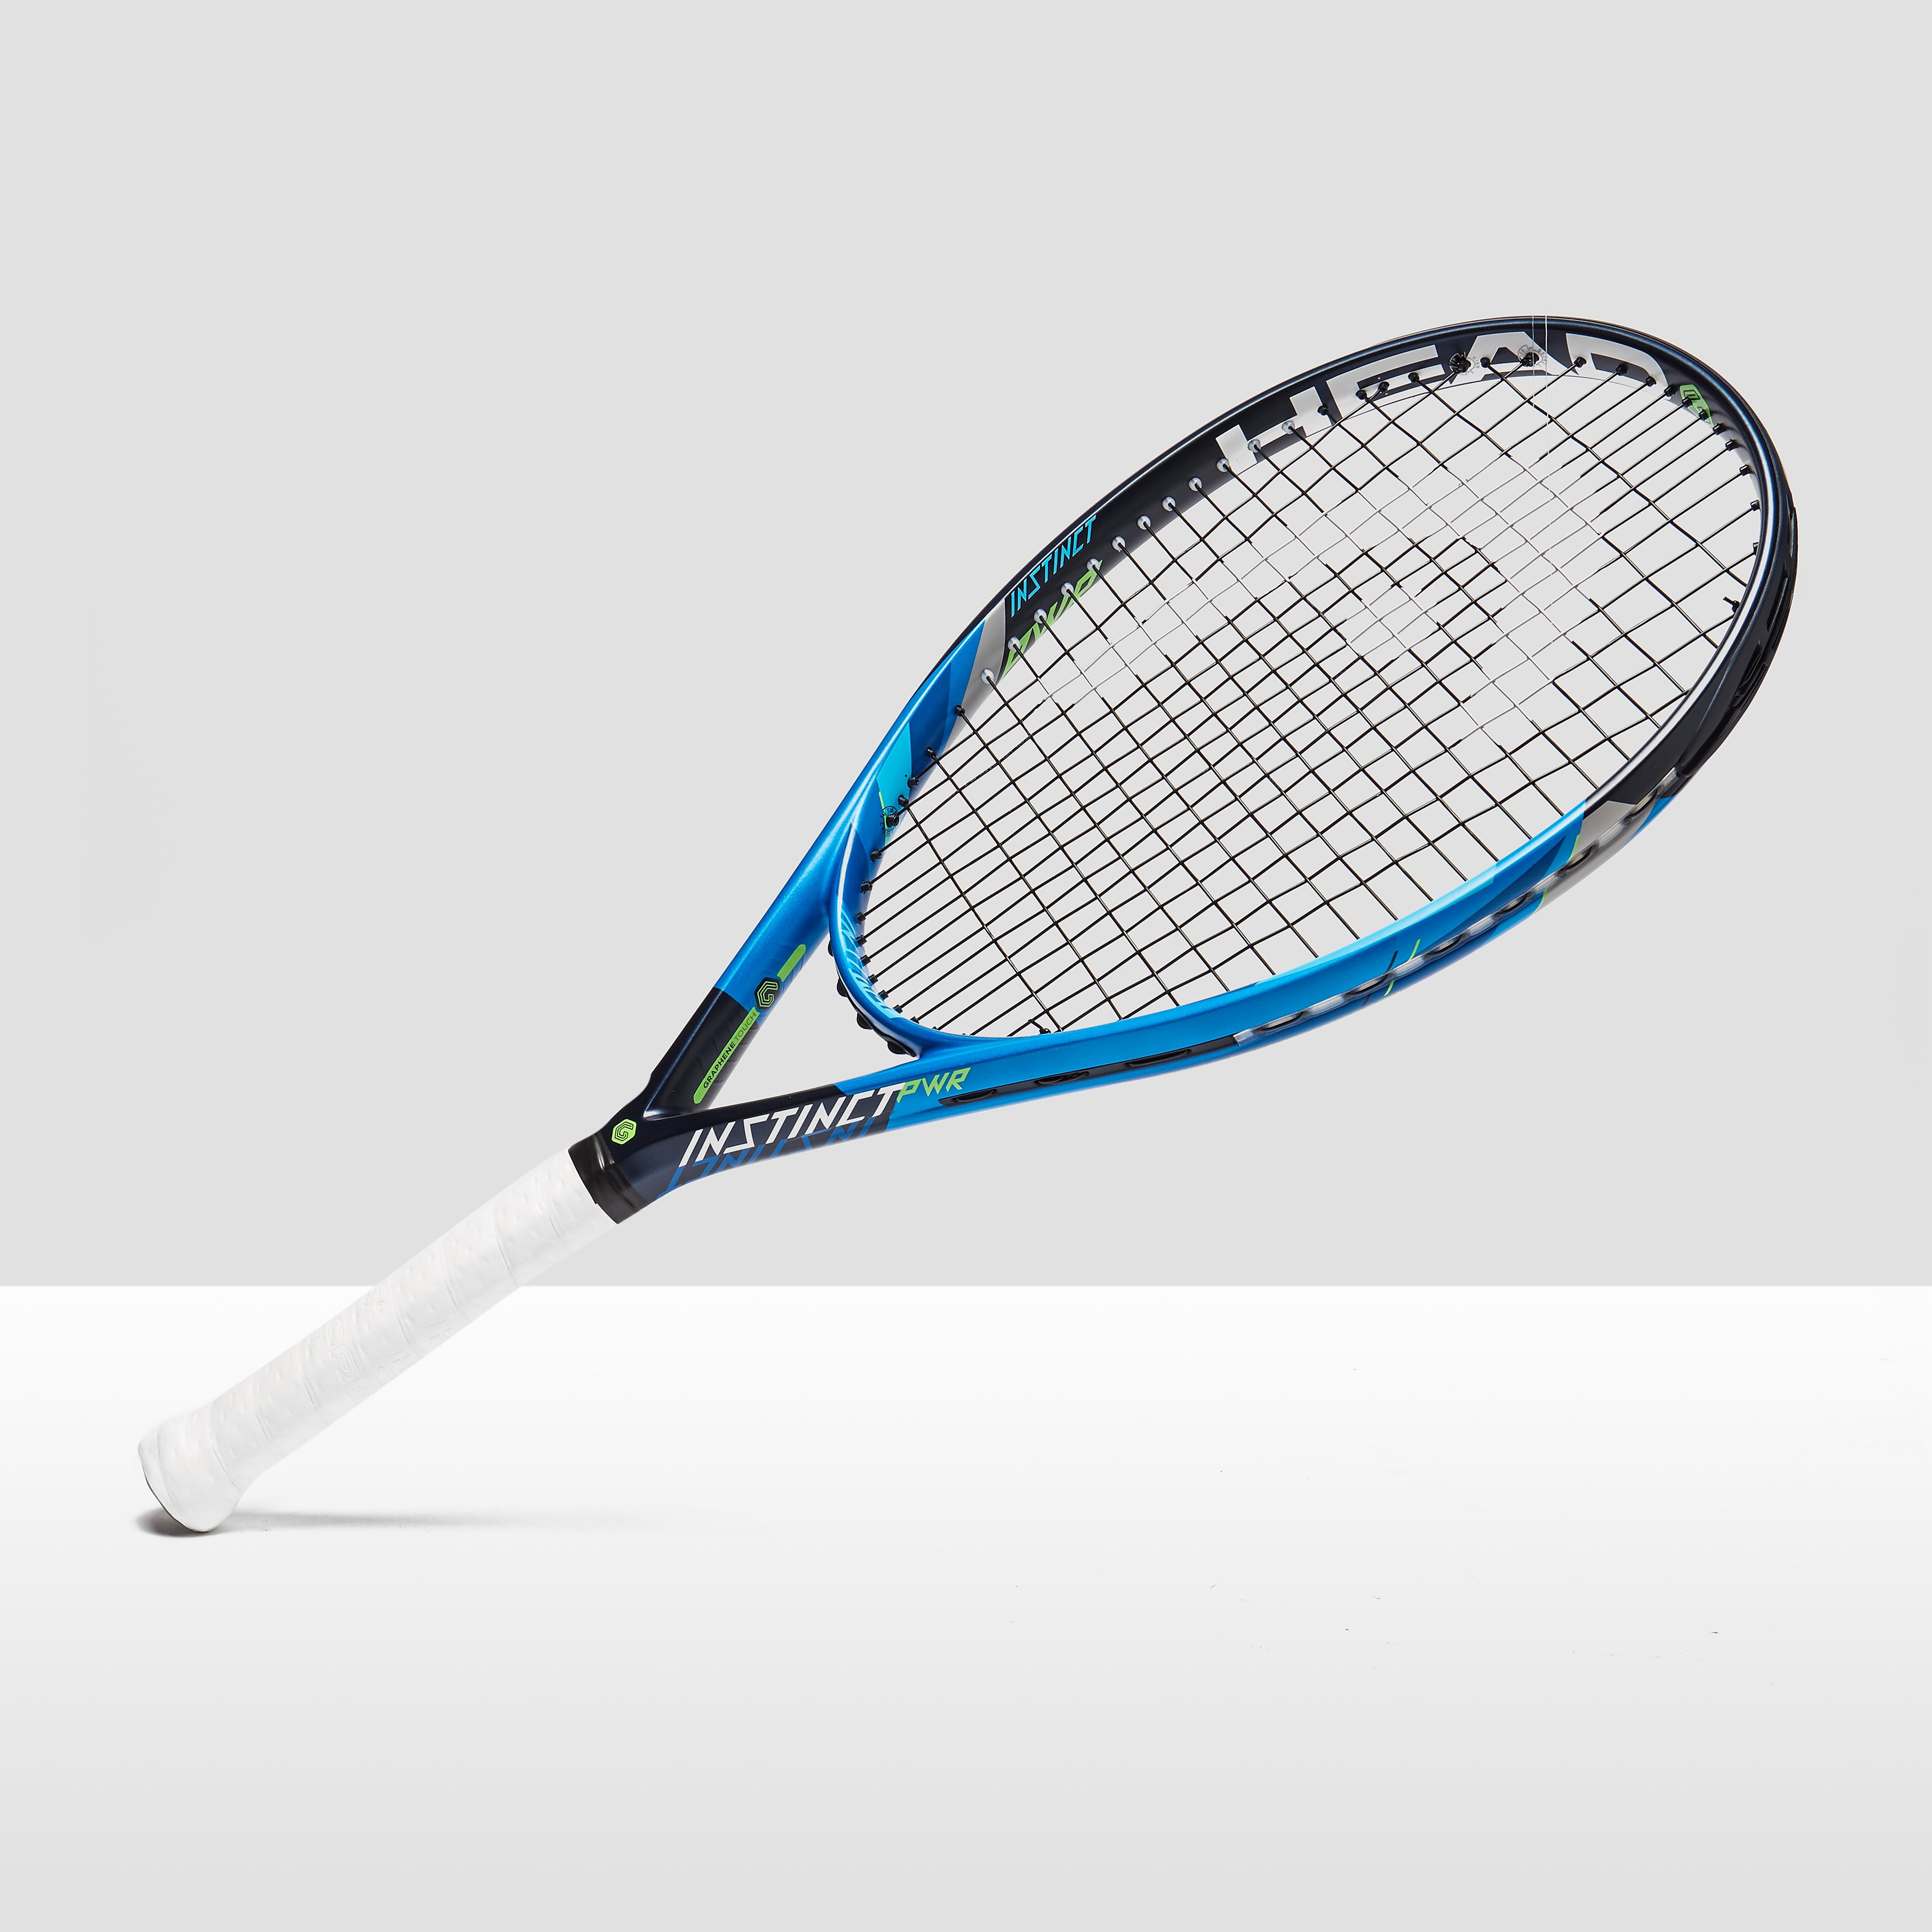 Head Graphene Touch Instinct PWR Tennis Racket